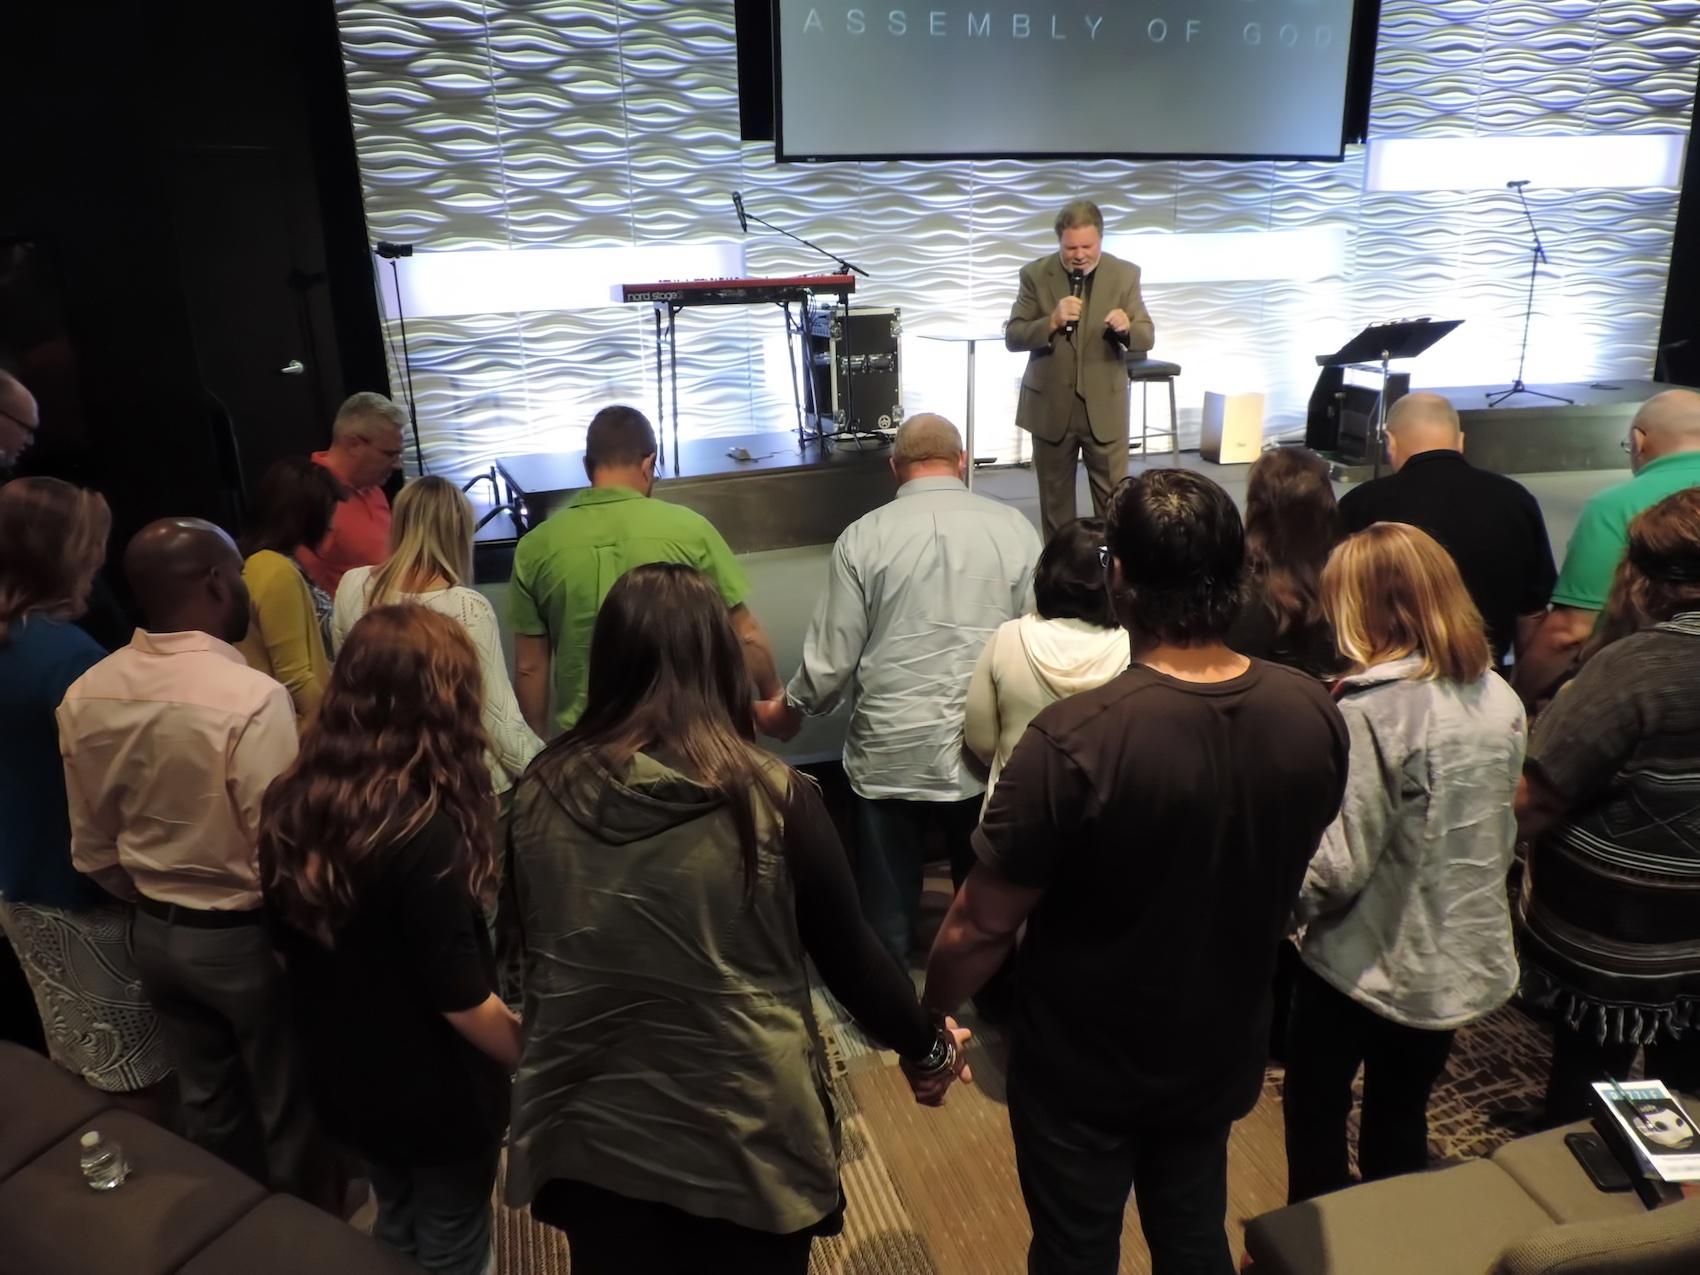 lankford-preaching